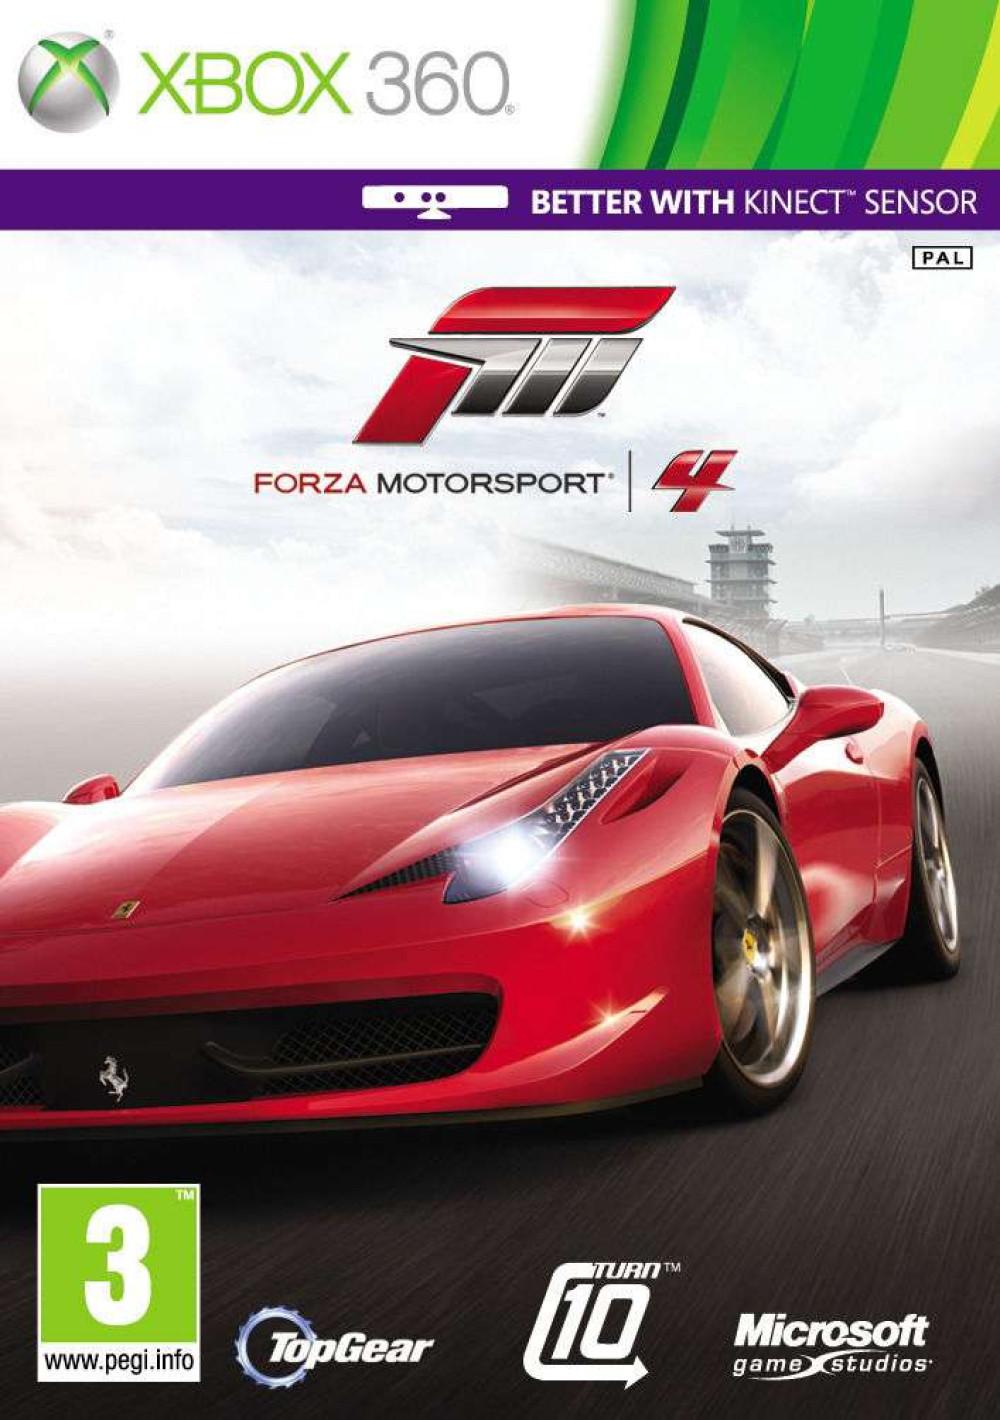 XBOX 360 Forza Motorsport 4